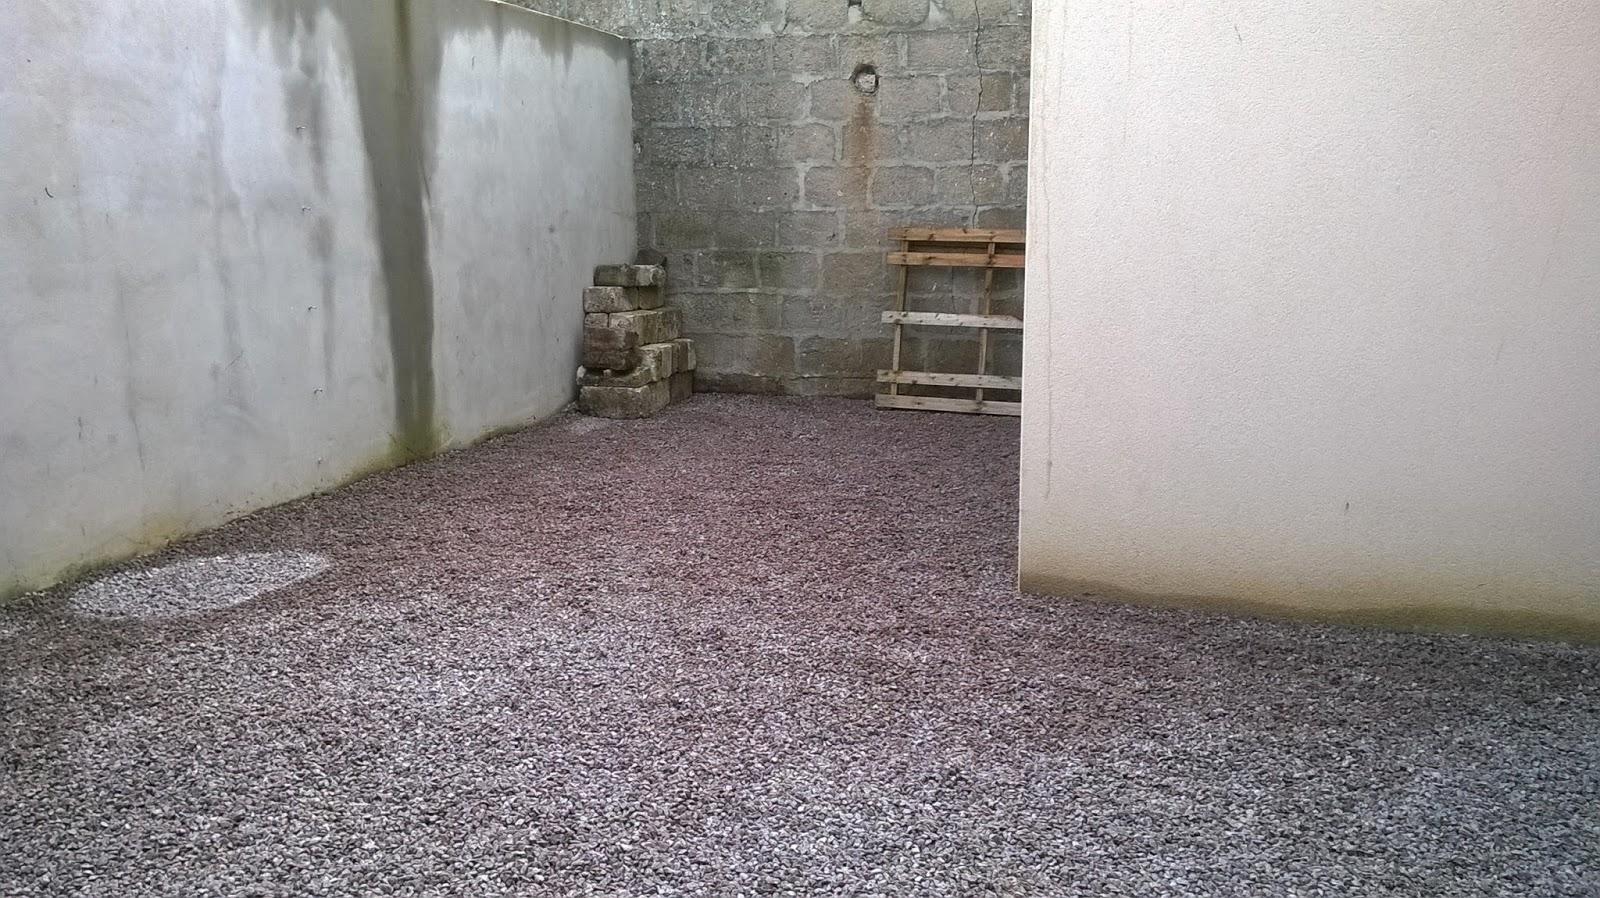 bourgault paysages terrassement d 39 une cour. Black Bedroom Furniture Sets. Home Design Ideas